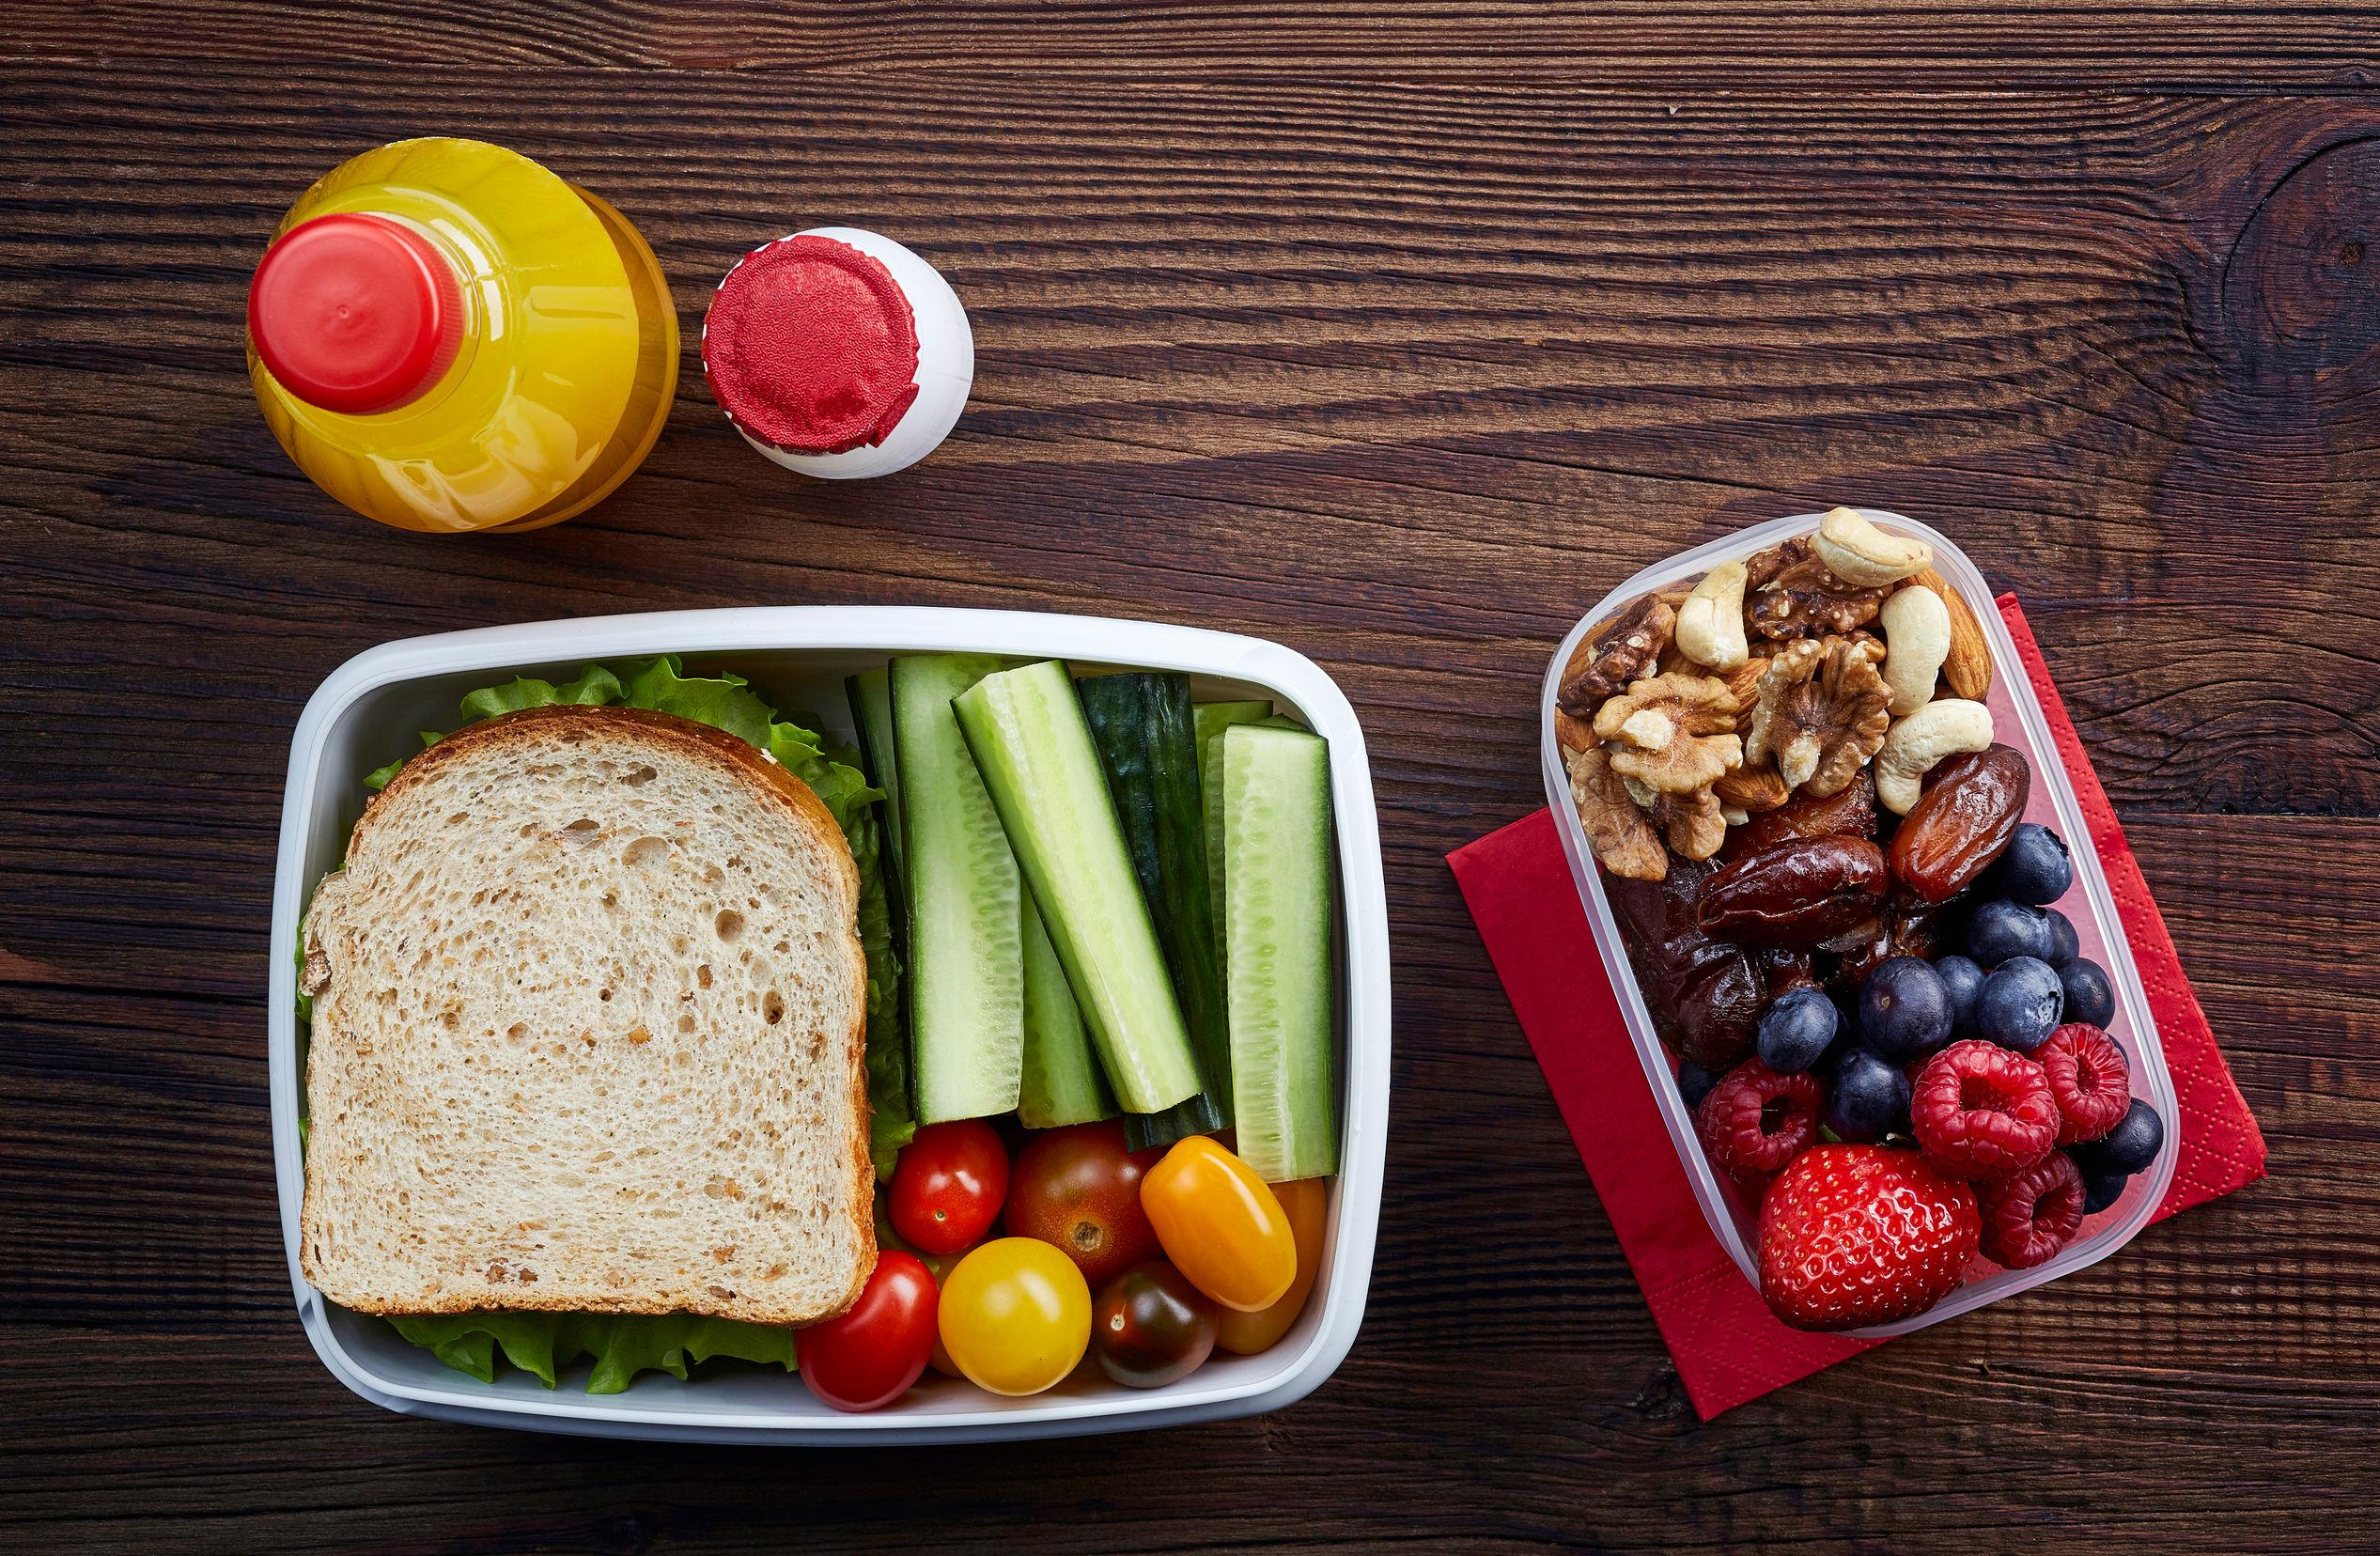 Pomysły na drugie śniadanie dla ucznia